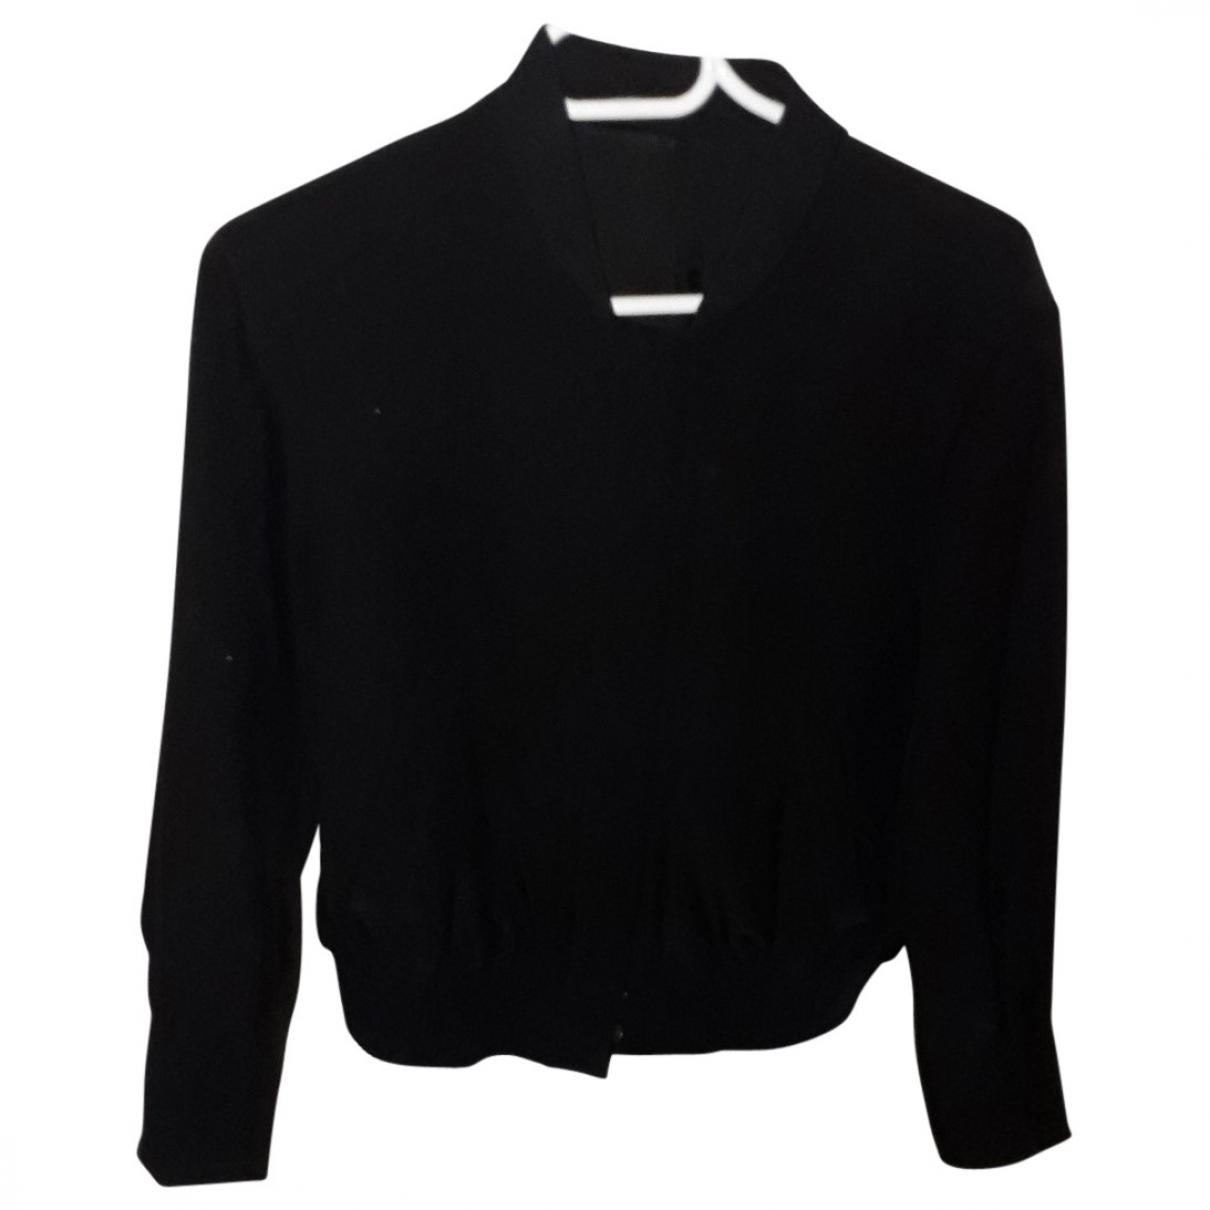 & Stories \N Black jacket for Women 36 FR